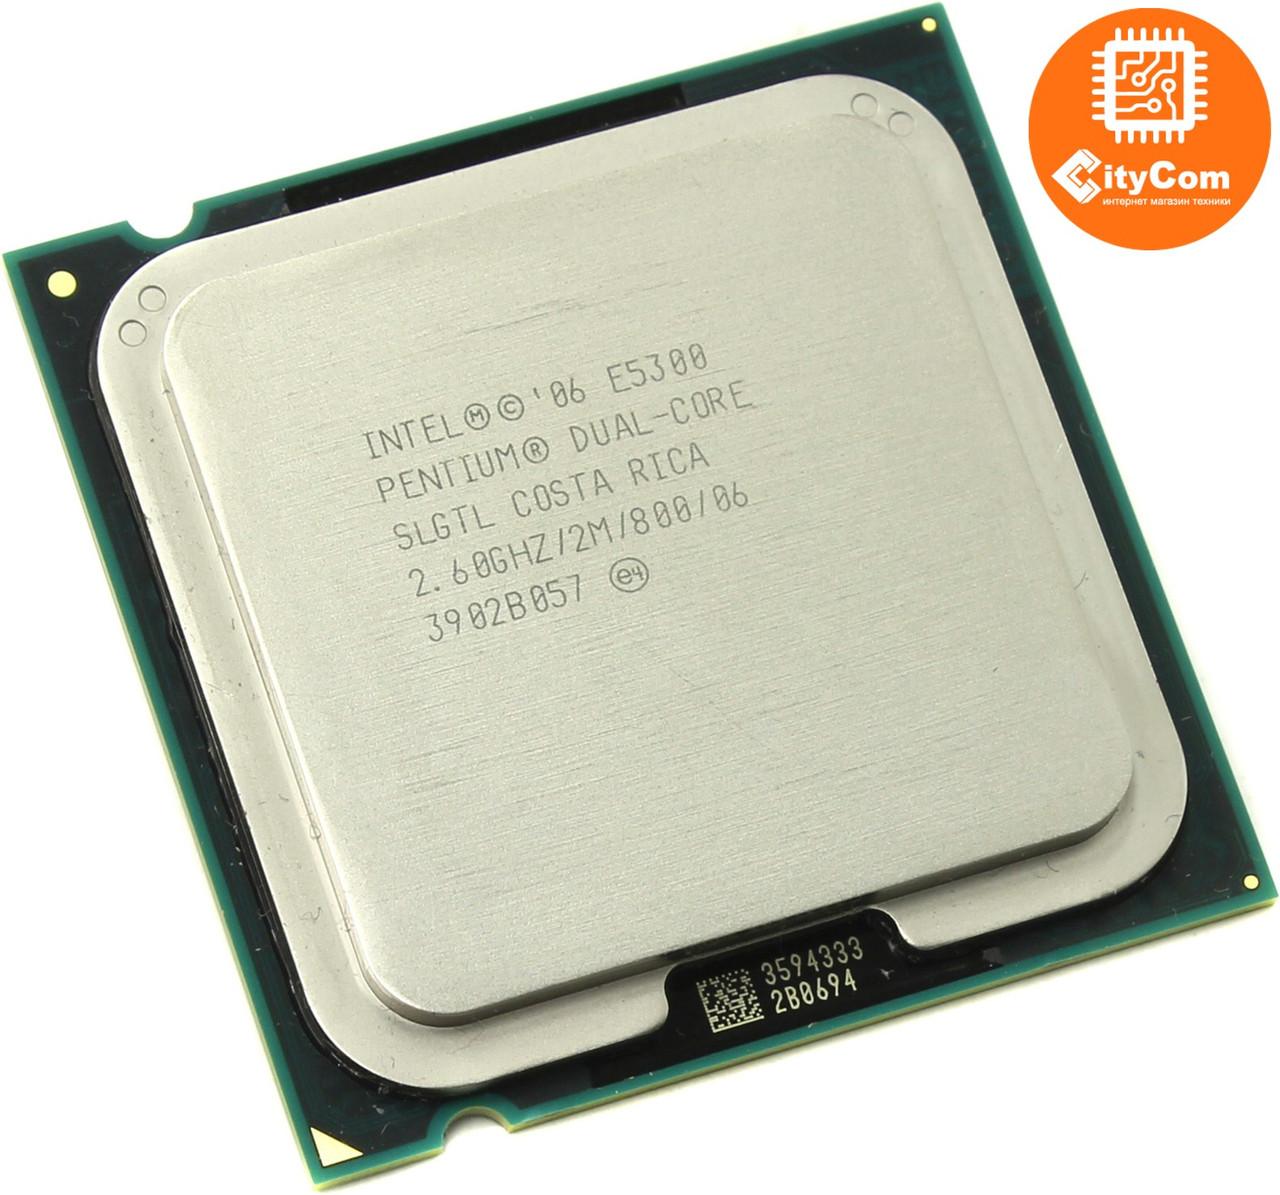 CPU S-775 Intel Pentium DualCore E5300 2.6GHz Арт.1378